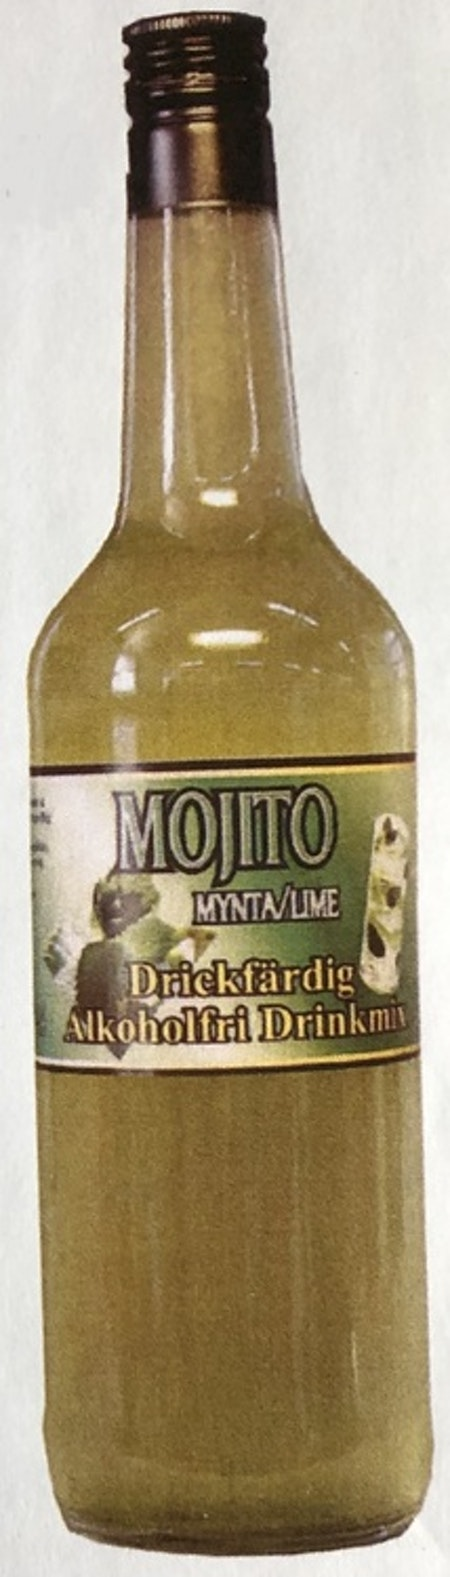 DRINKMIX MOJITO